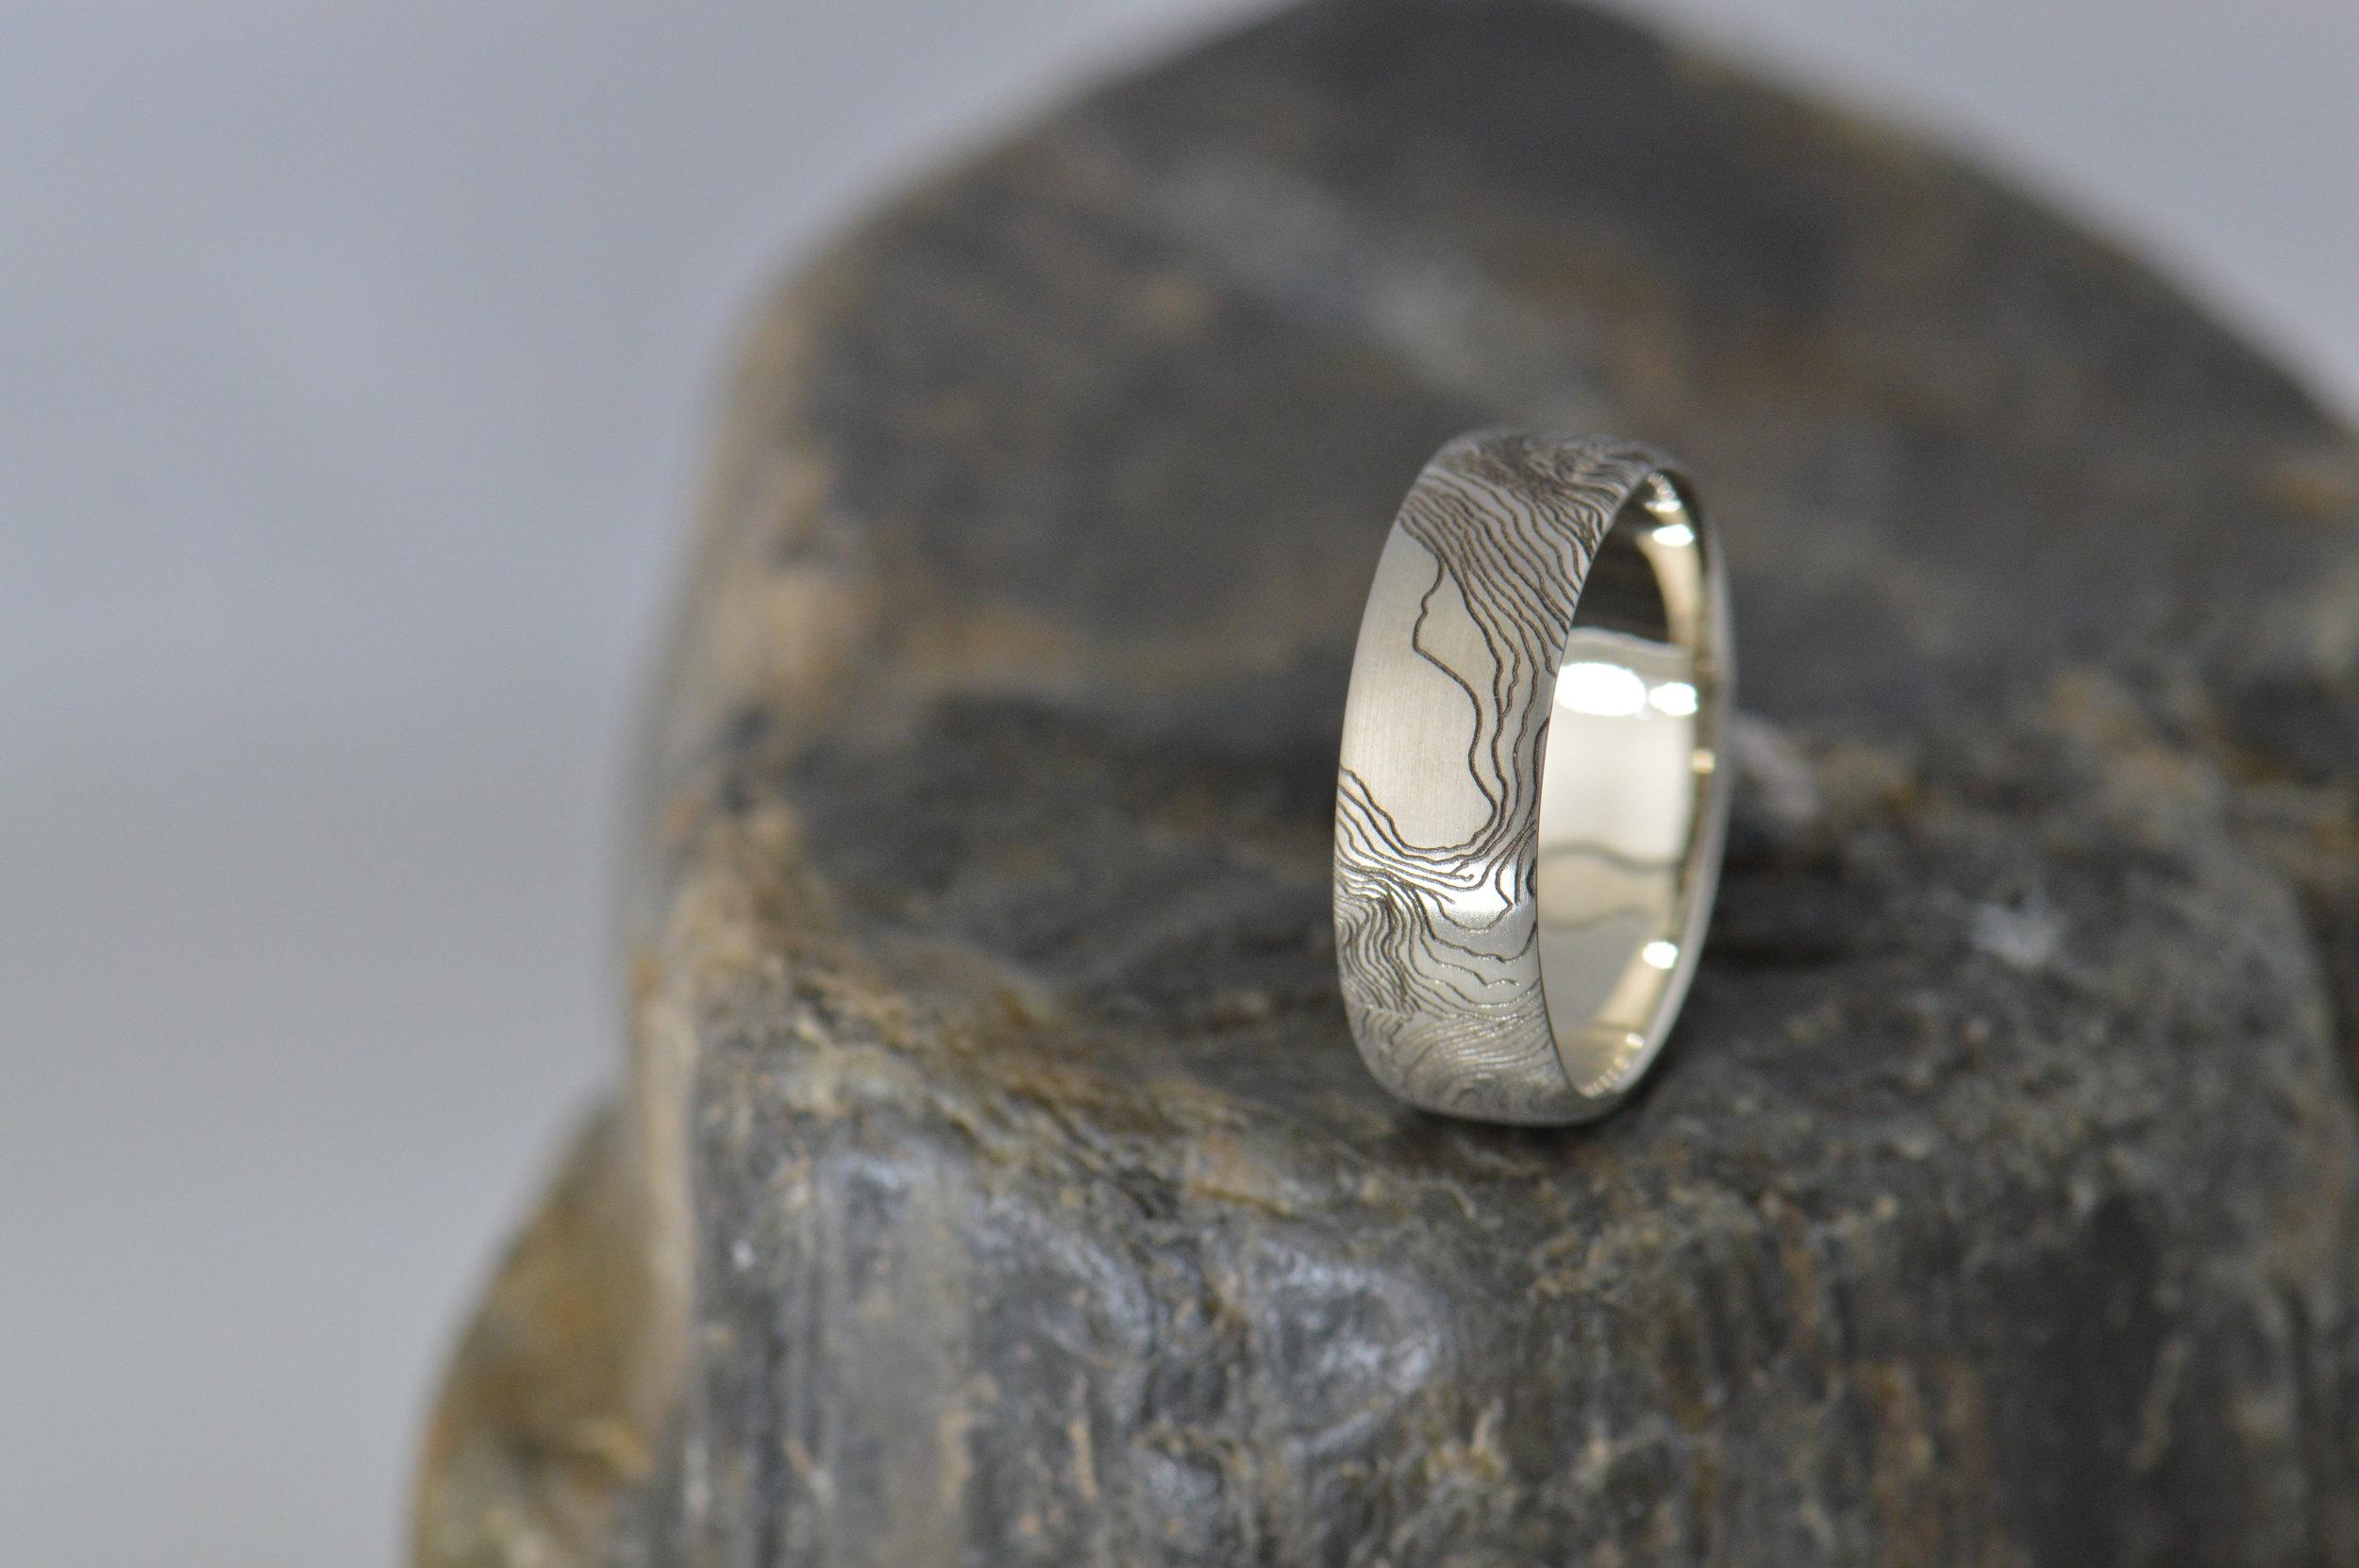 darvier-topo-map-engraving-gold-ring.JPG